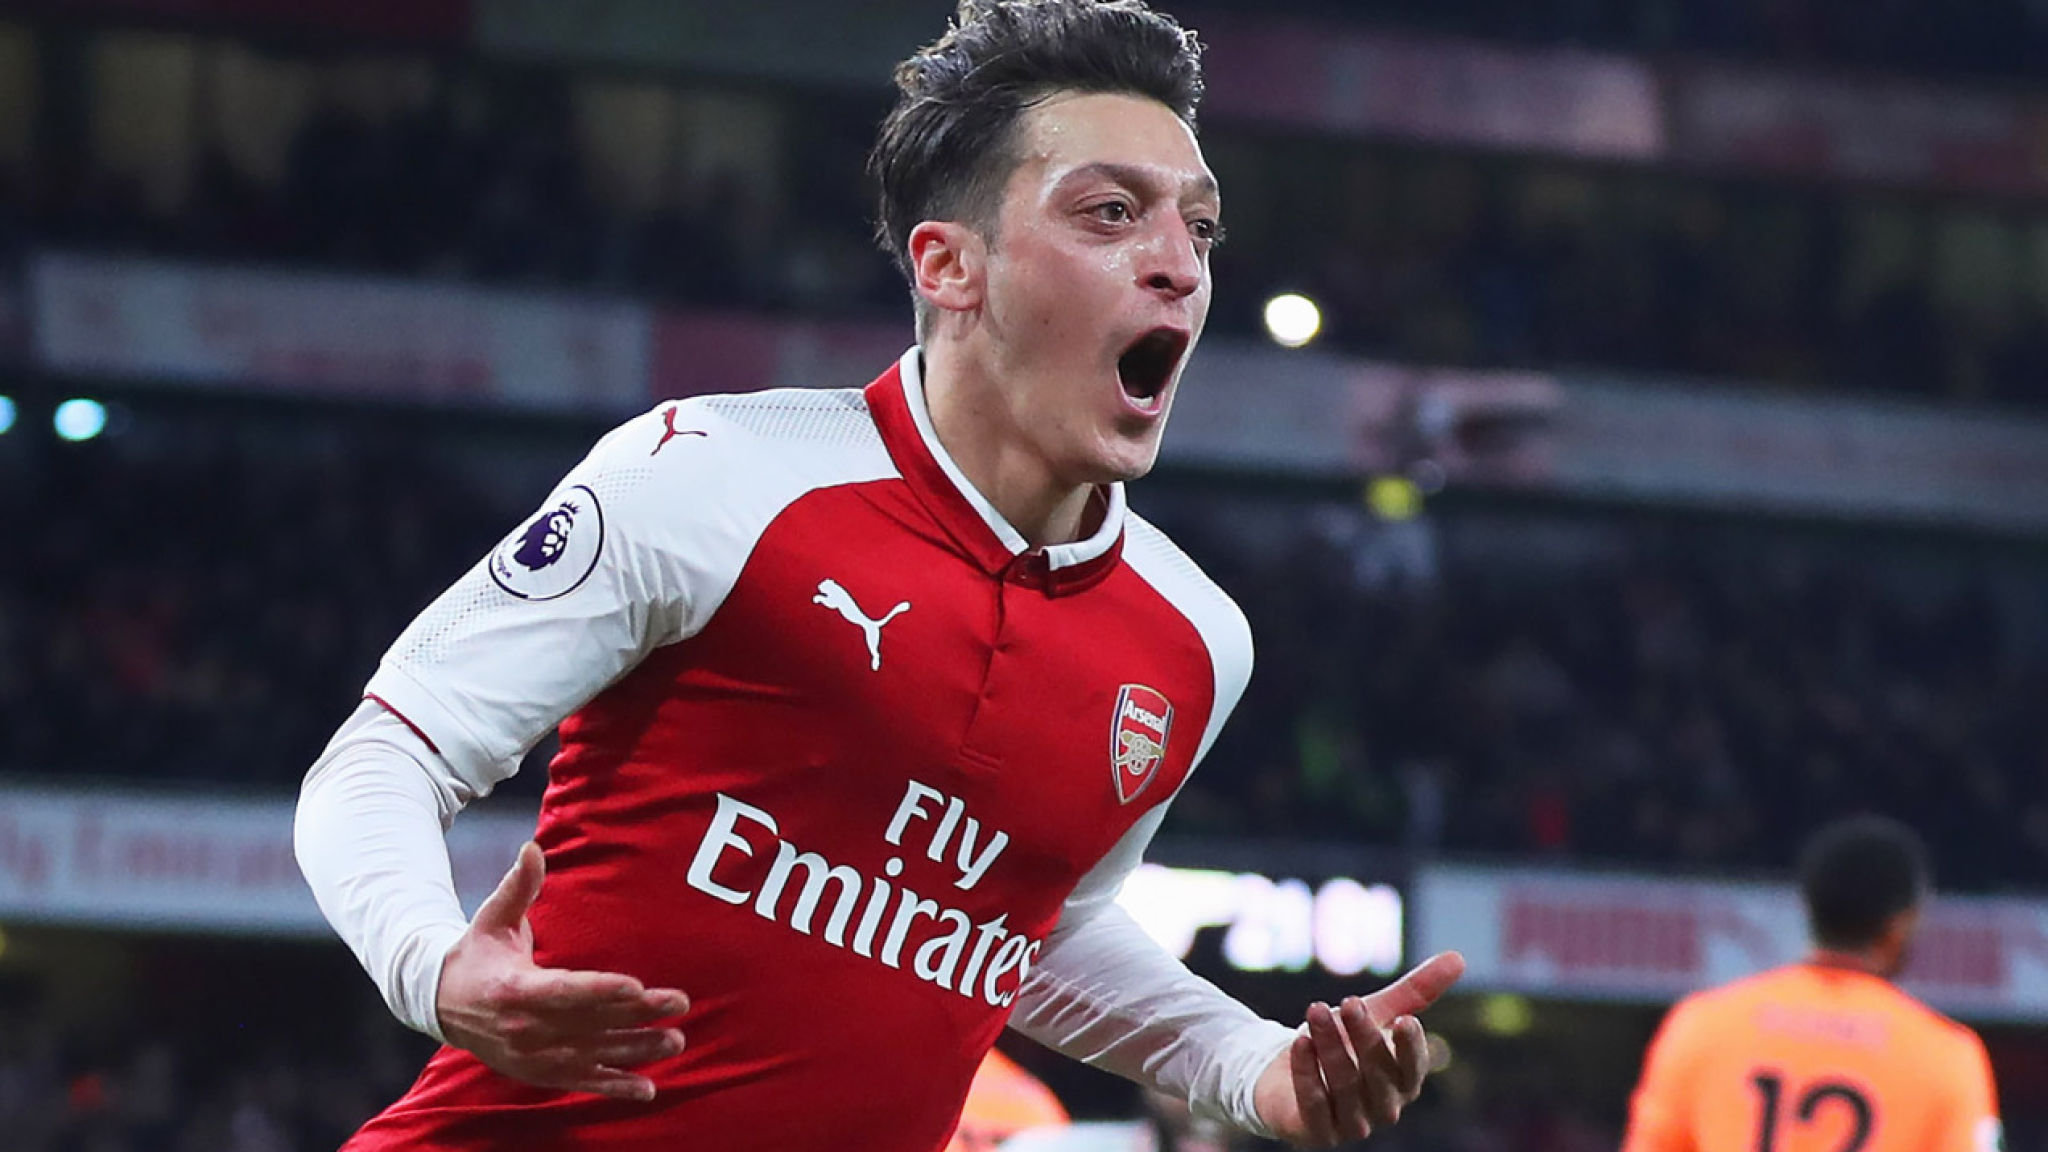 Arsenal great Paul Merson slams Mesut Ozil for Mikel Arteta comments - Bóng Đá